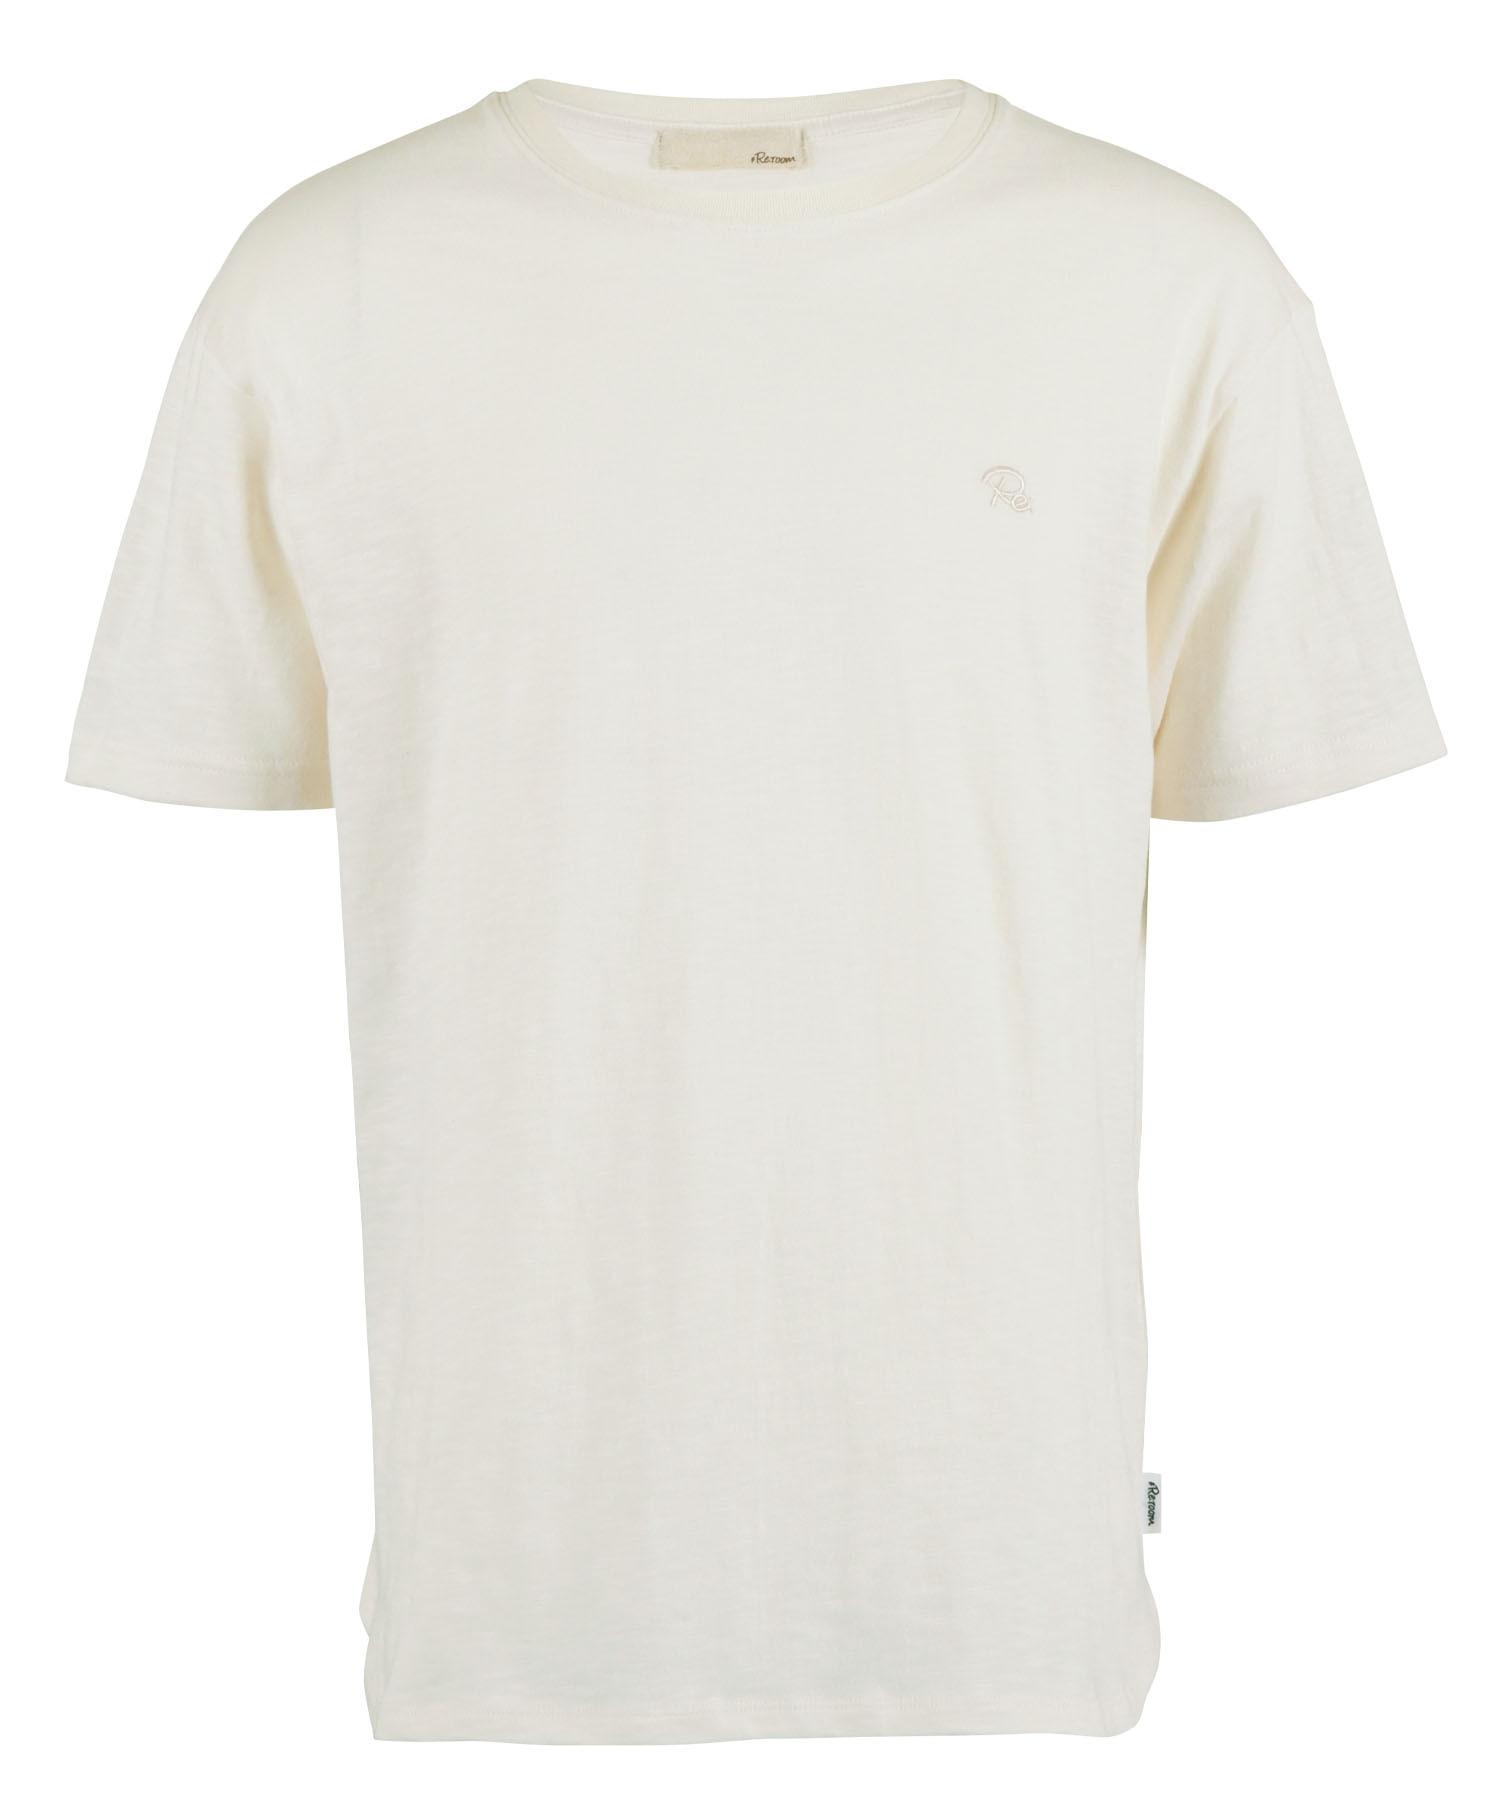 ONE POINT SLAB T-shirt[REC484]